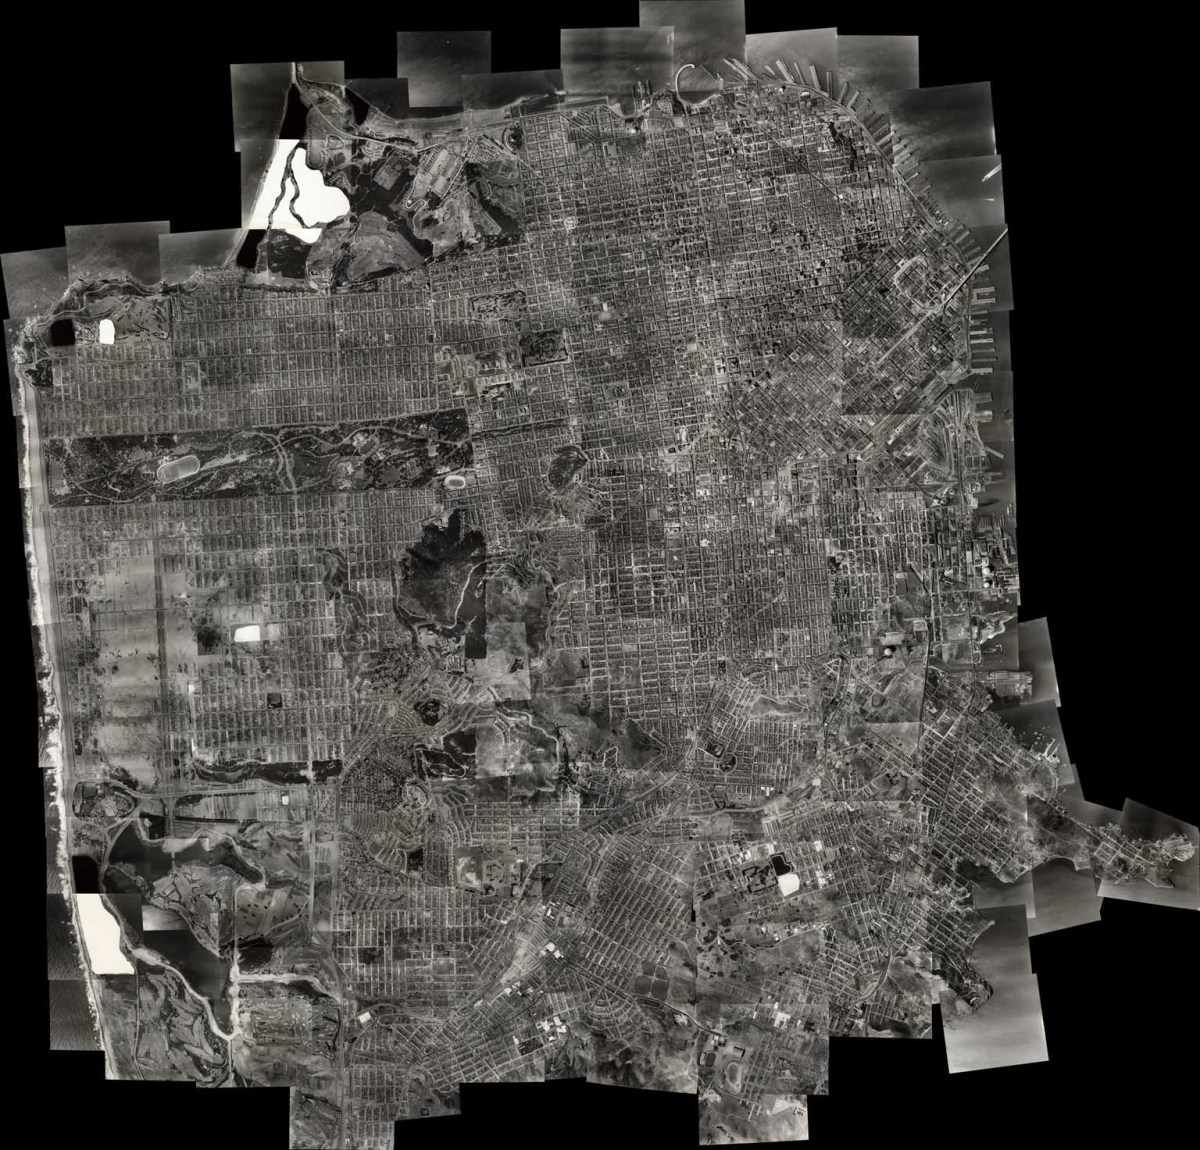 online Strength of fibrous composites 2011